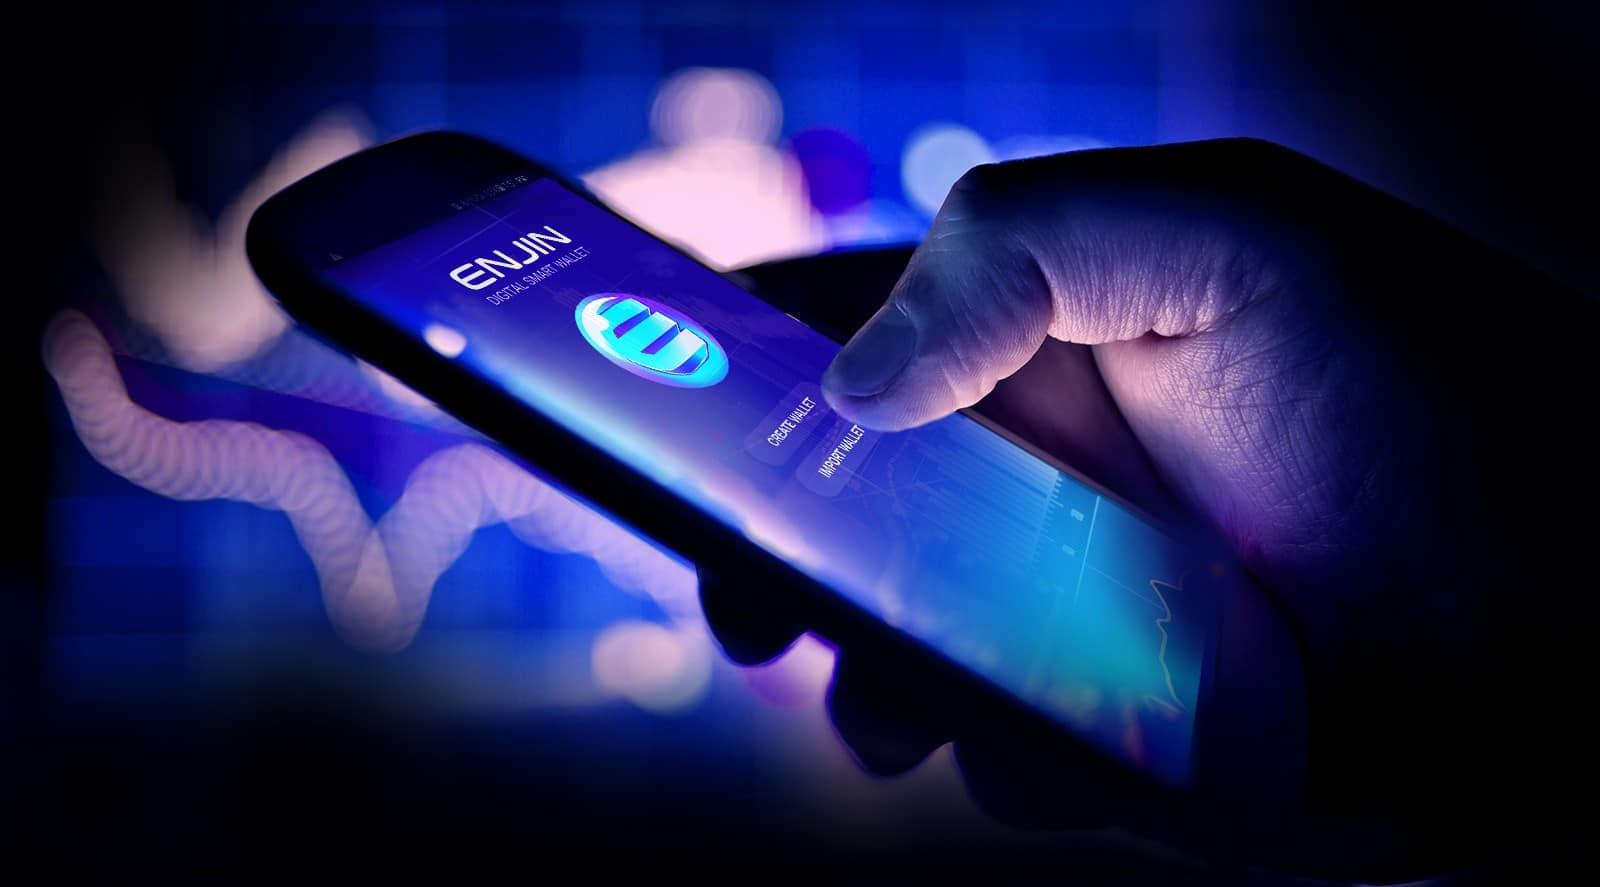 Enjin (ENJ) Surges 60% Following Partnership With Microsoft